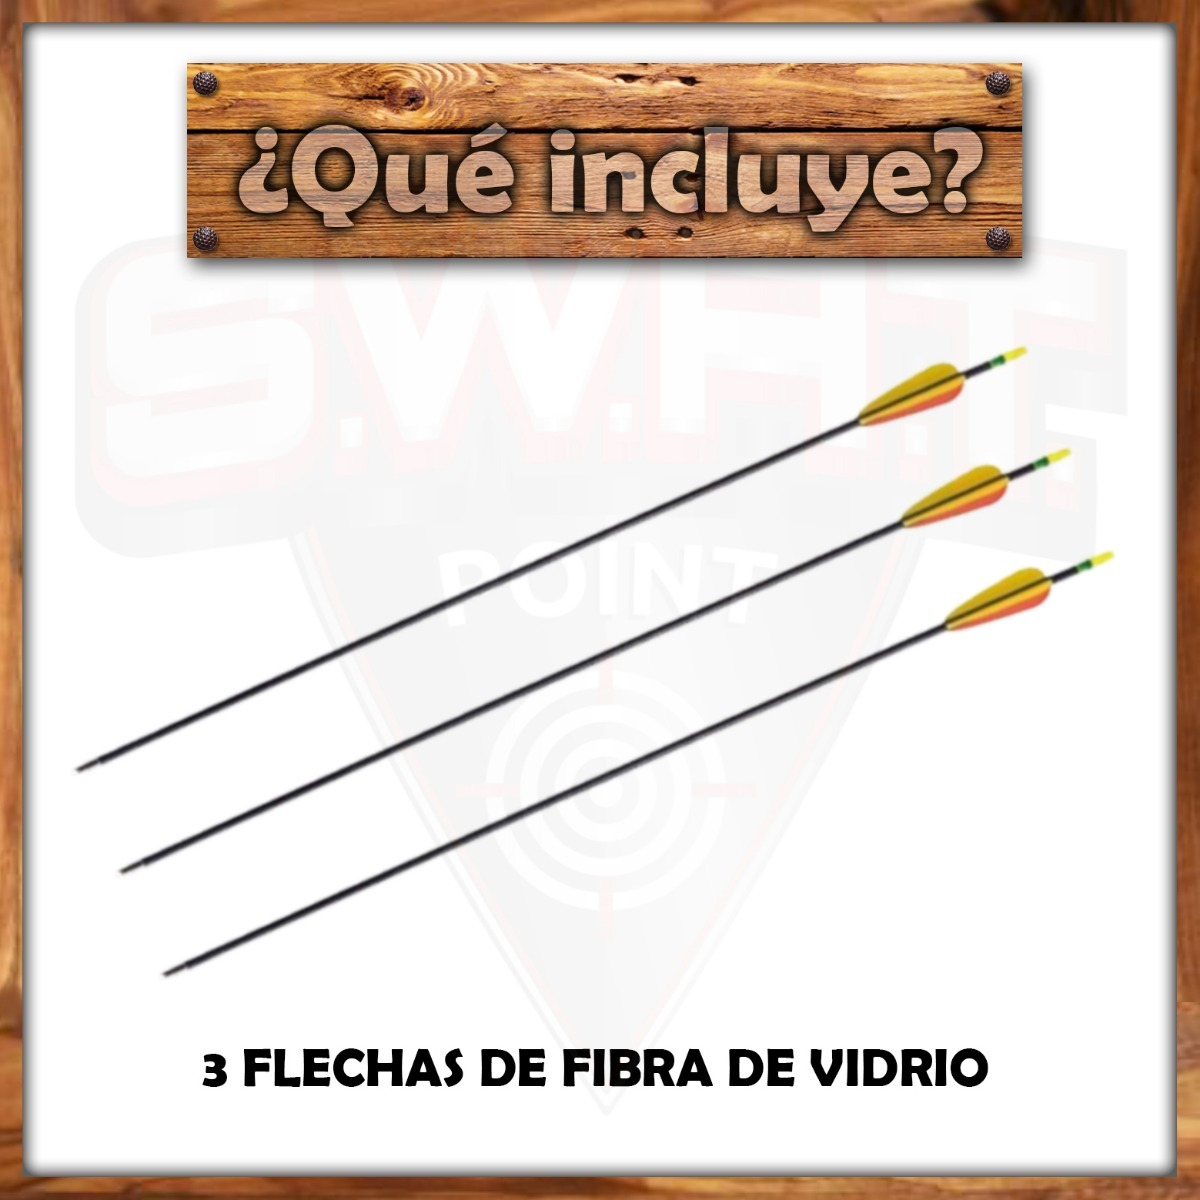 Arco Recurvo Profesional Prana Td4 Olímpico 3 Flechas Fibra